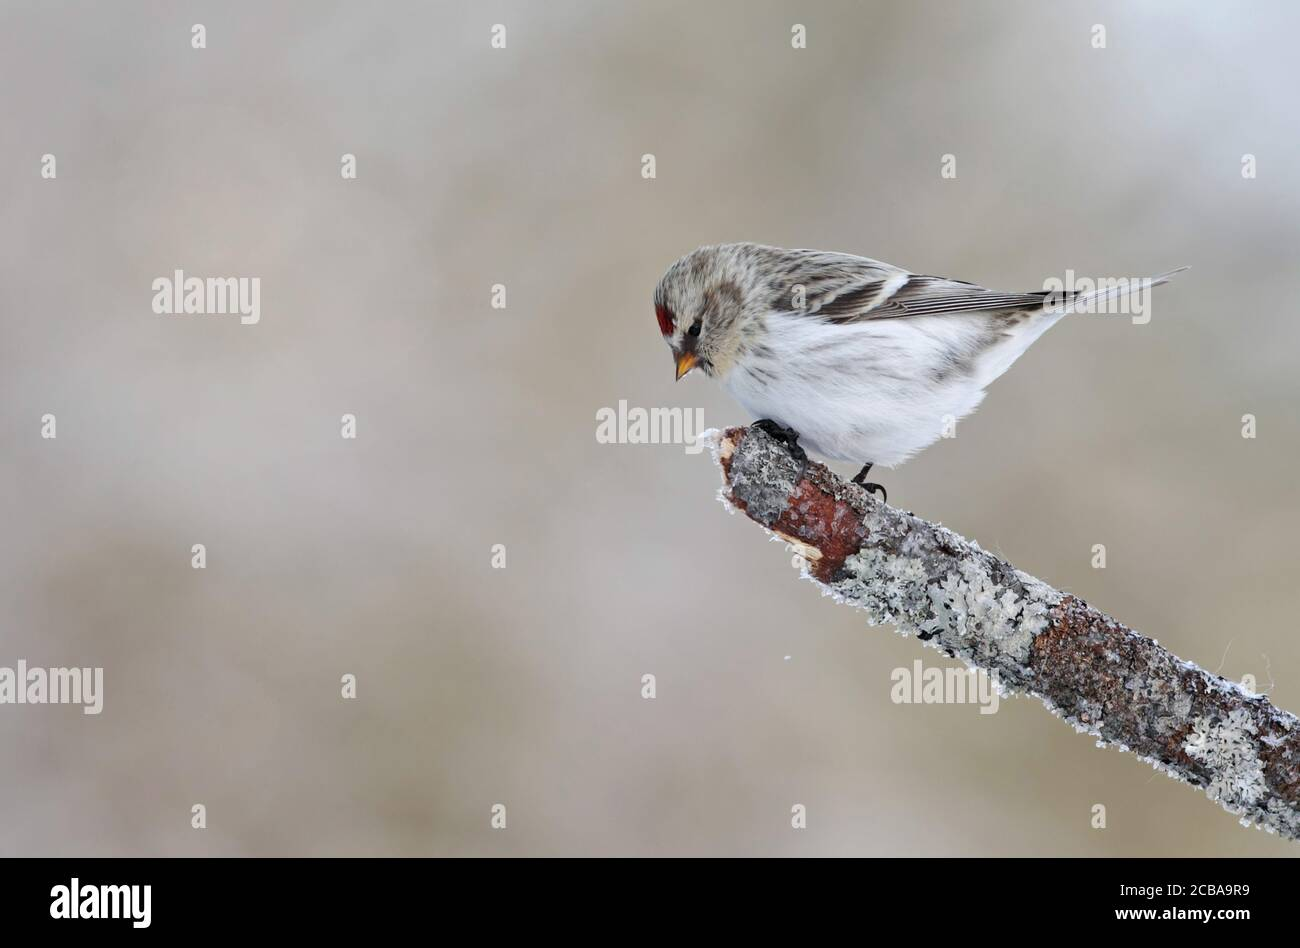 arctic redpoll, hoary redpoll (Carduelis hornemanni exilipes, Acanthis hornemanni exilipes), persiguiendo en una rama rota, vista lateral, Finlandia, Kaamanen Foto de stock